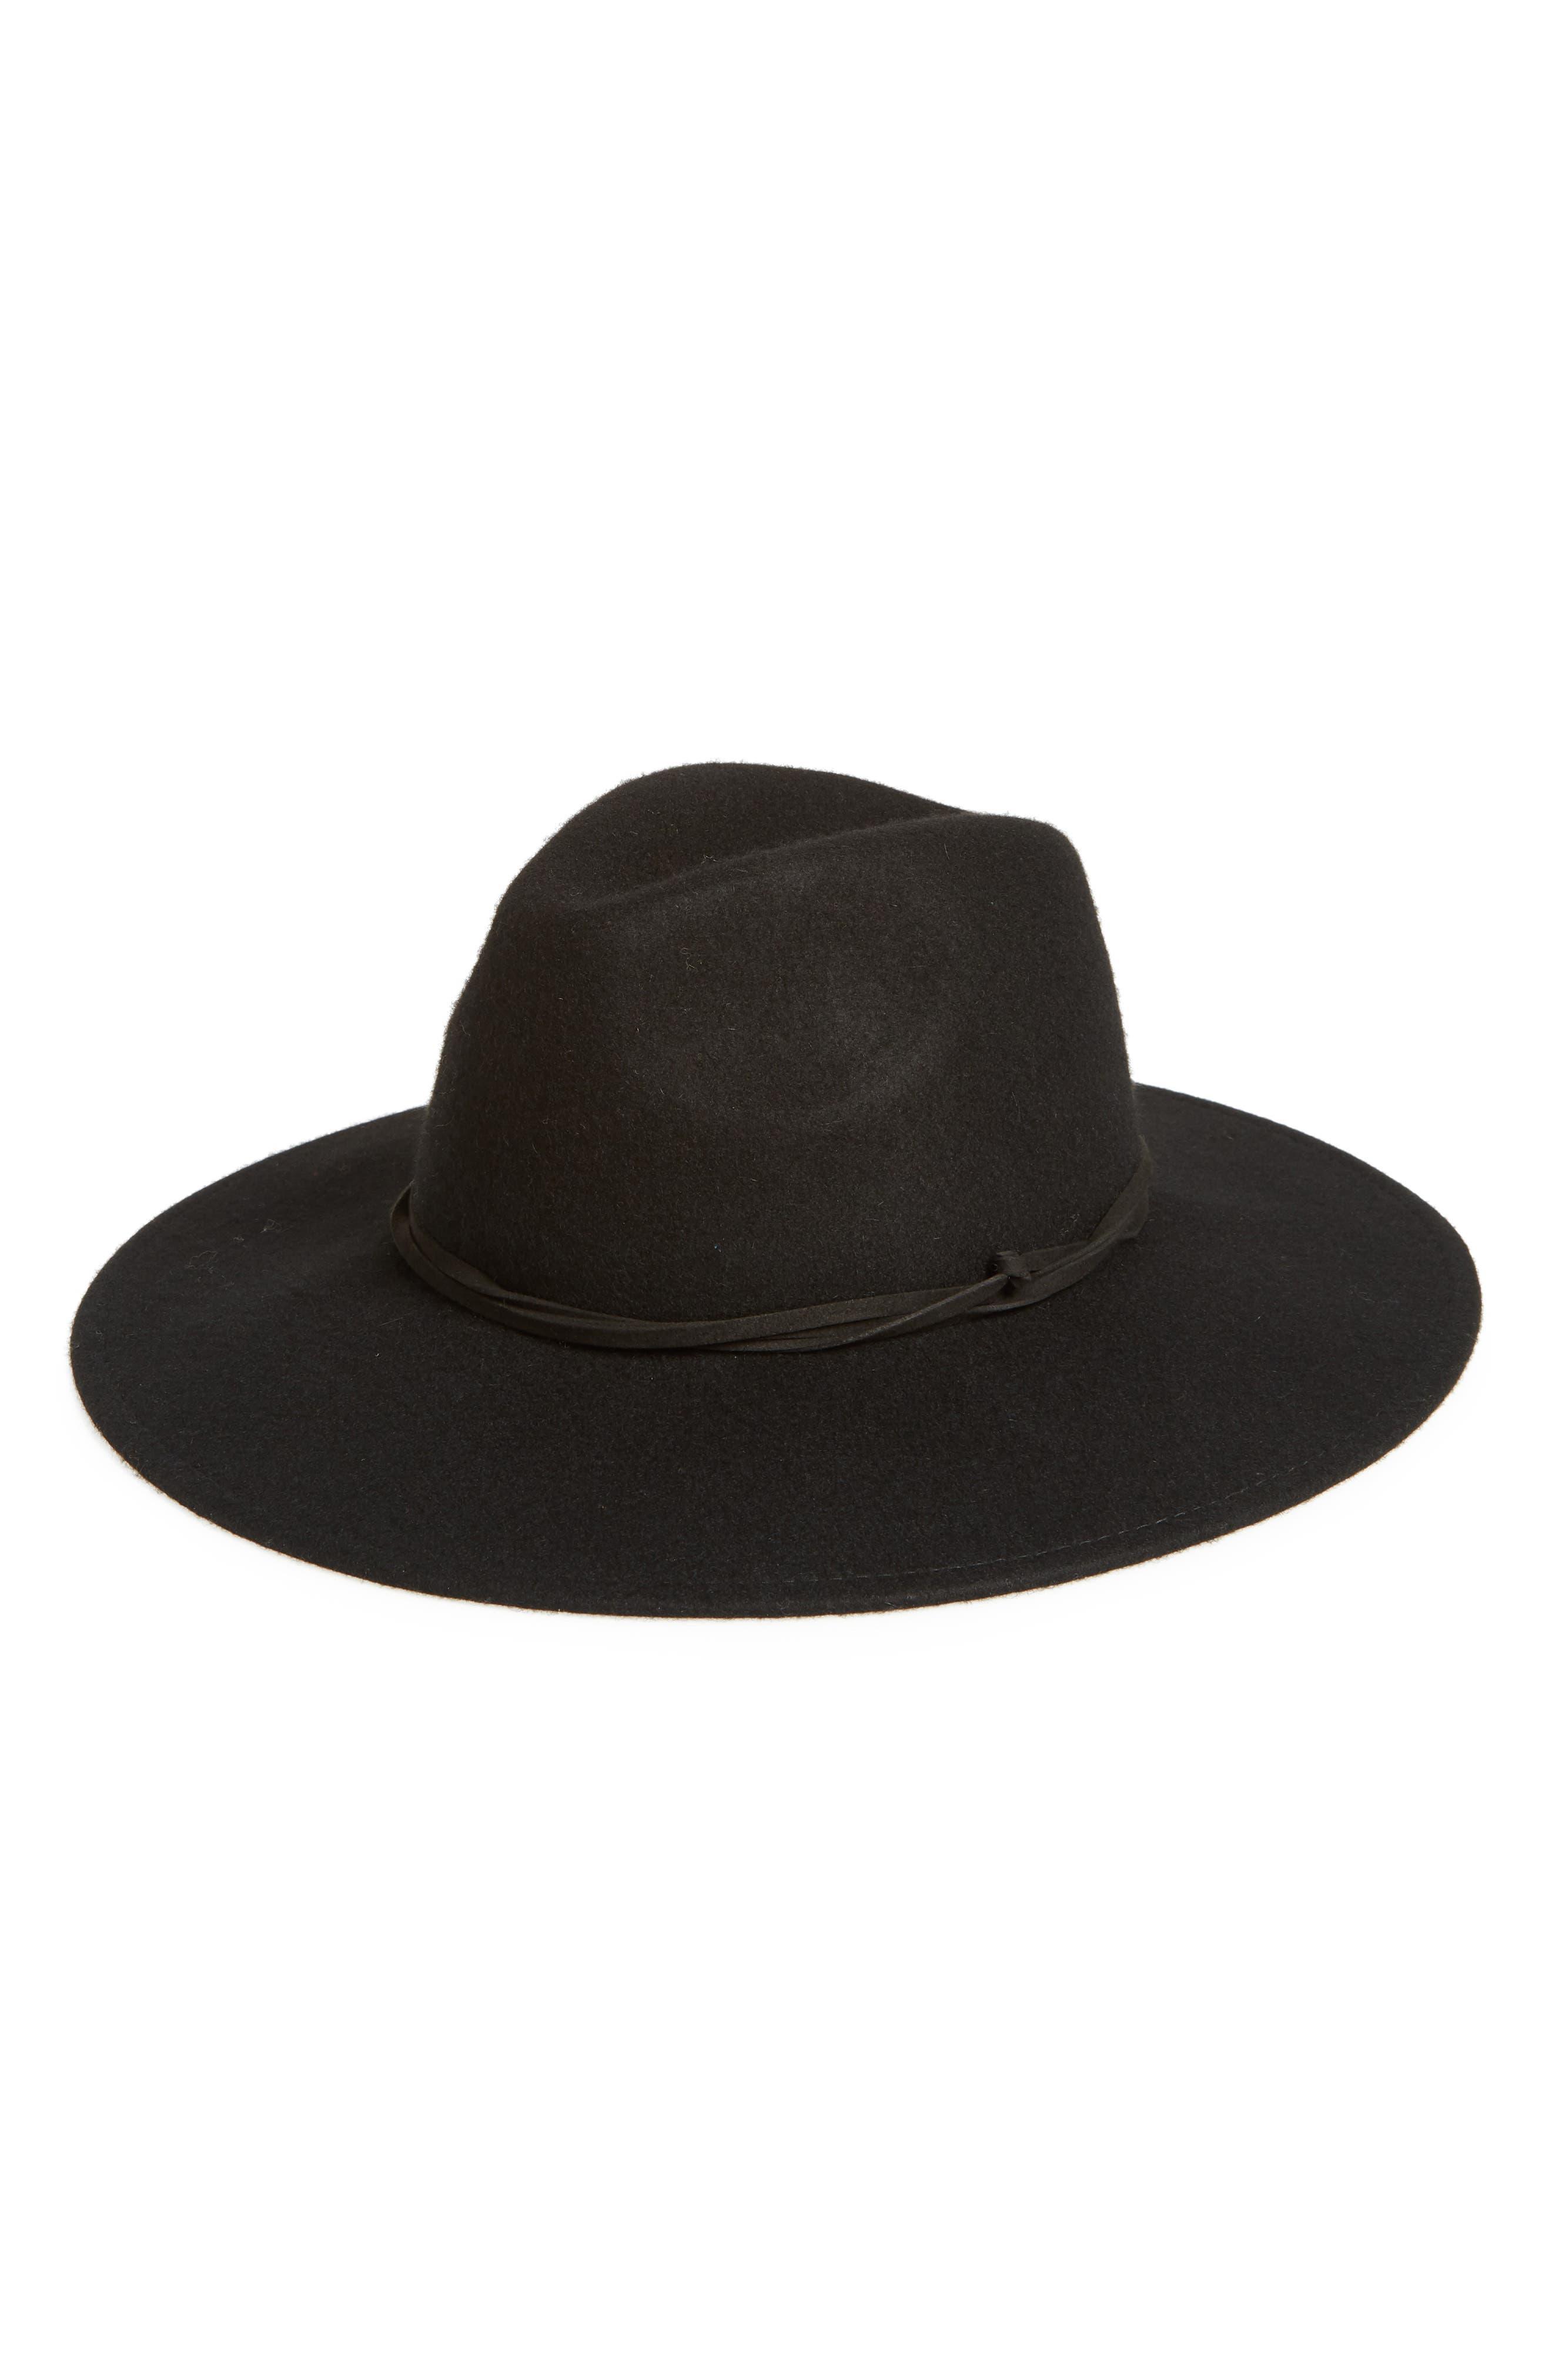 Felt Panama Hat,                             Main thumbnail 1, color,                             001